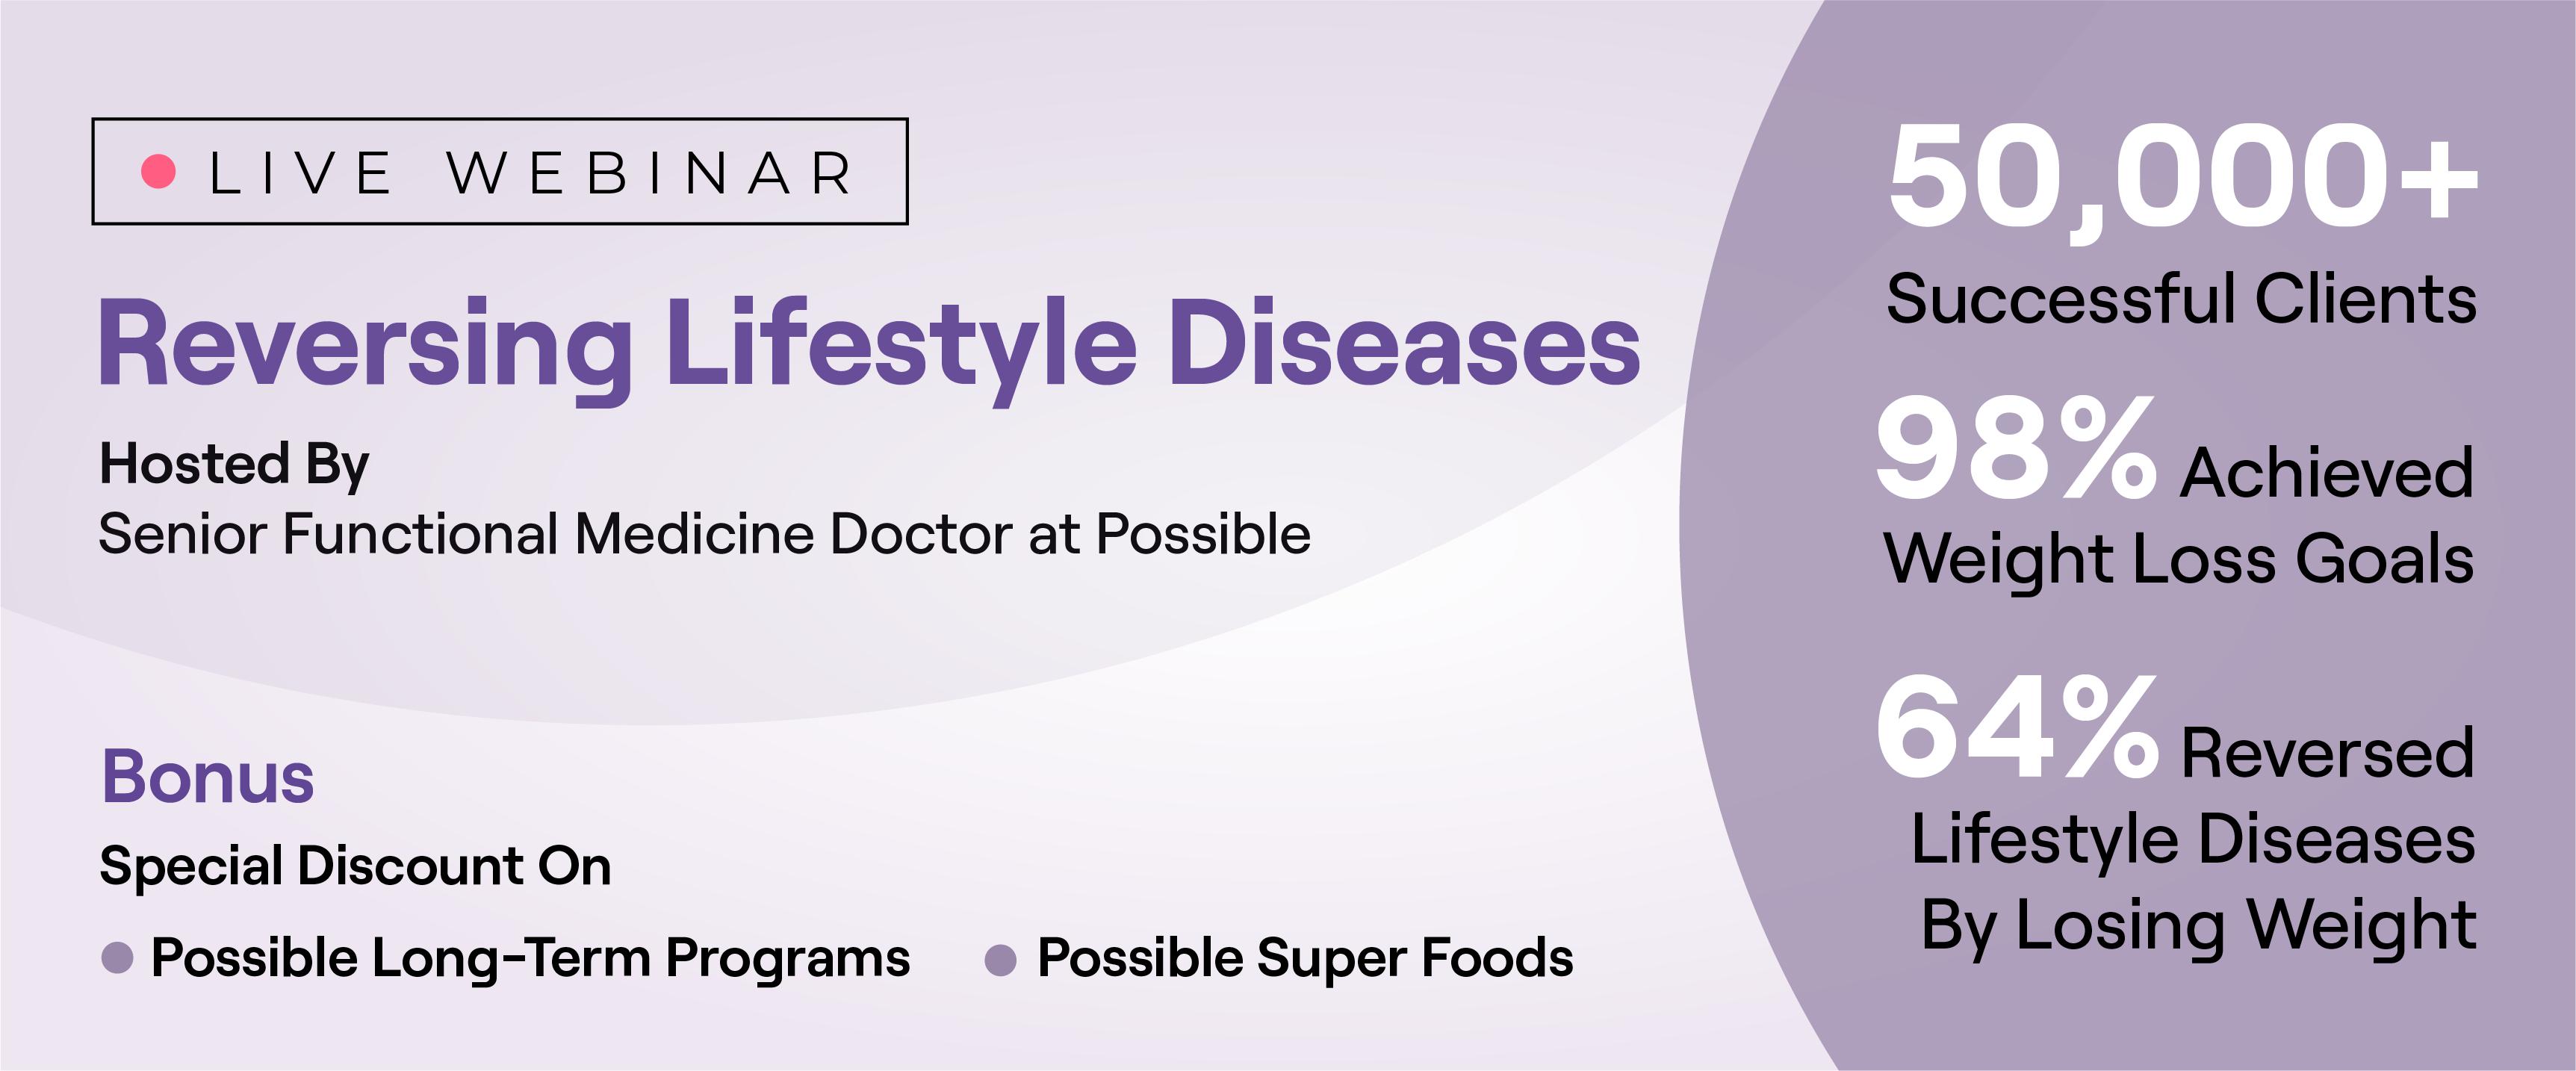 Reversing Lifestyle Diseases